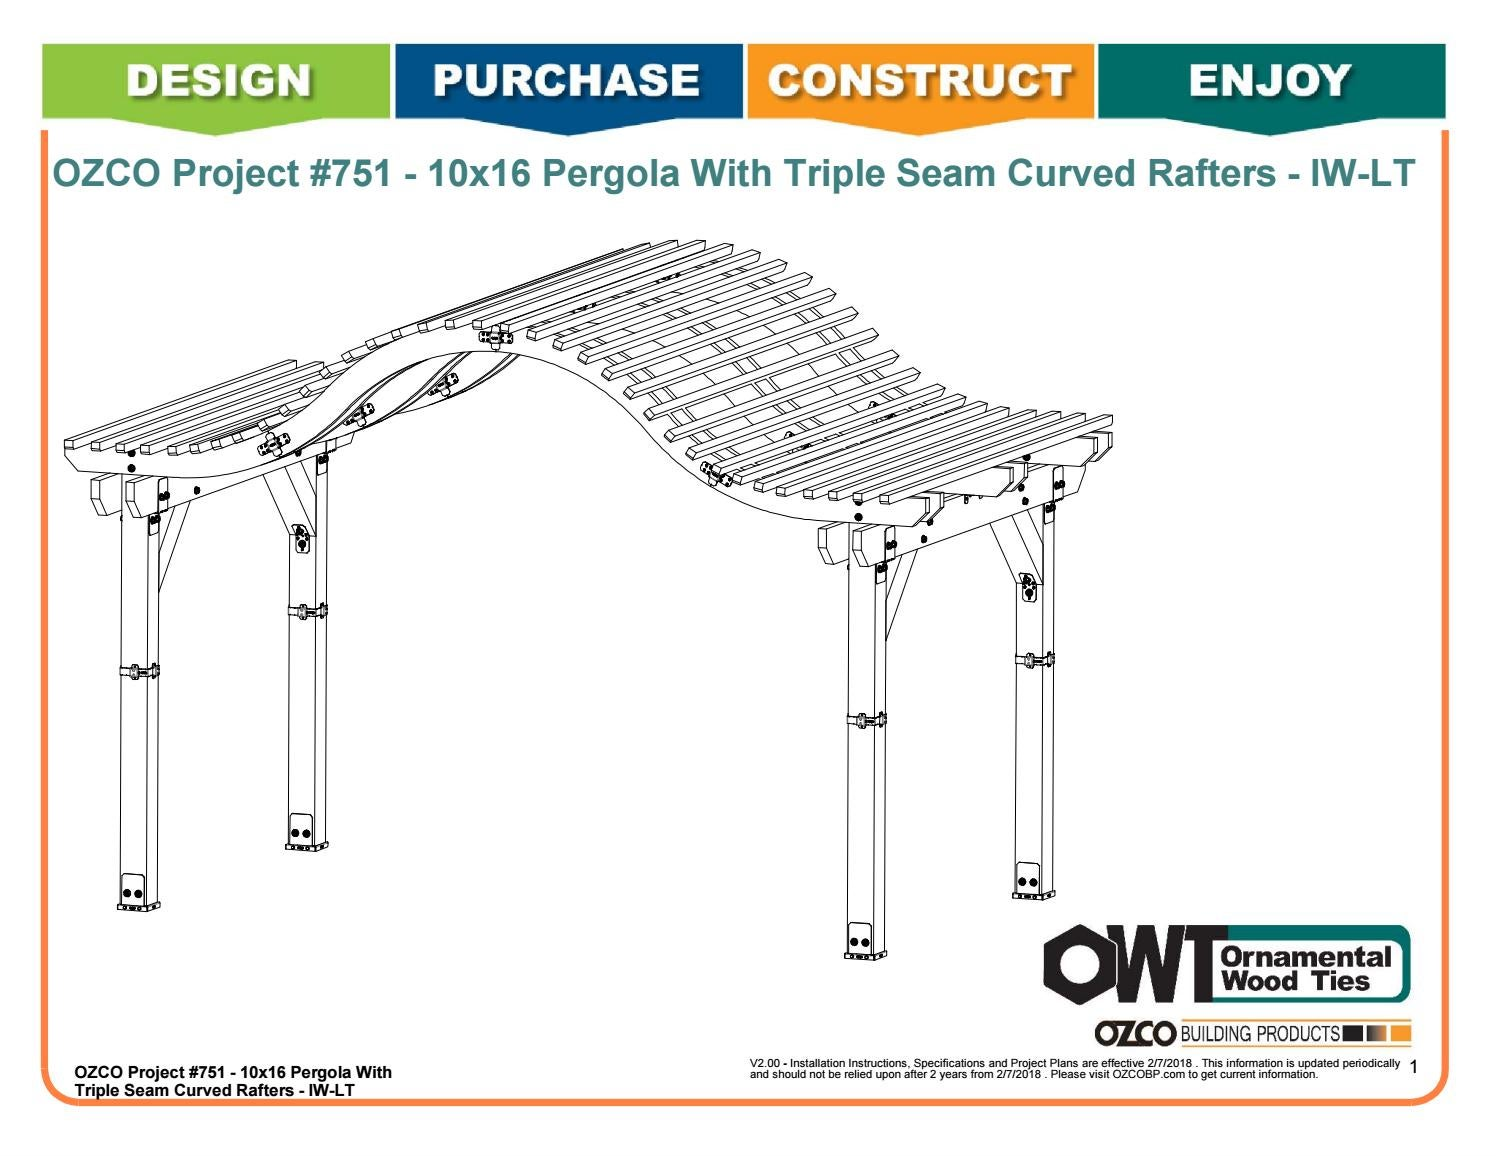 Ozco Project 751 10x16 Pergola With Triple Seam Curved